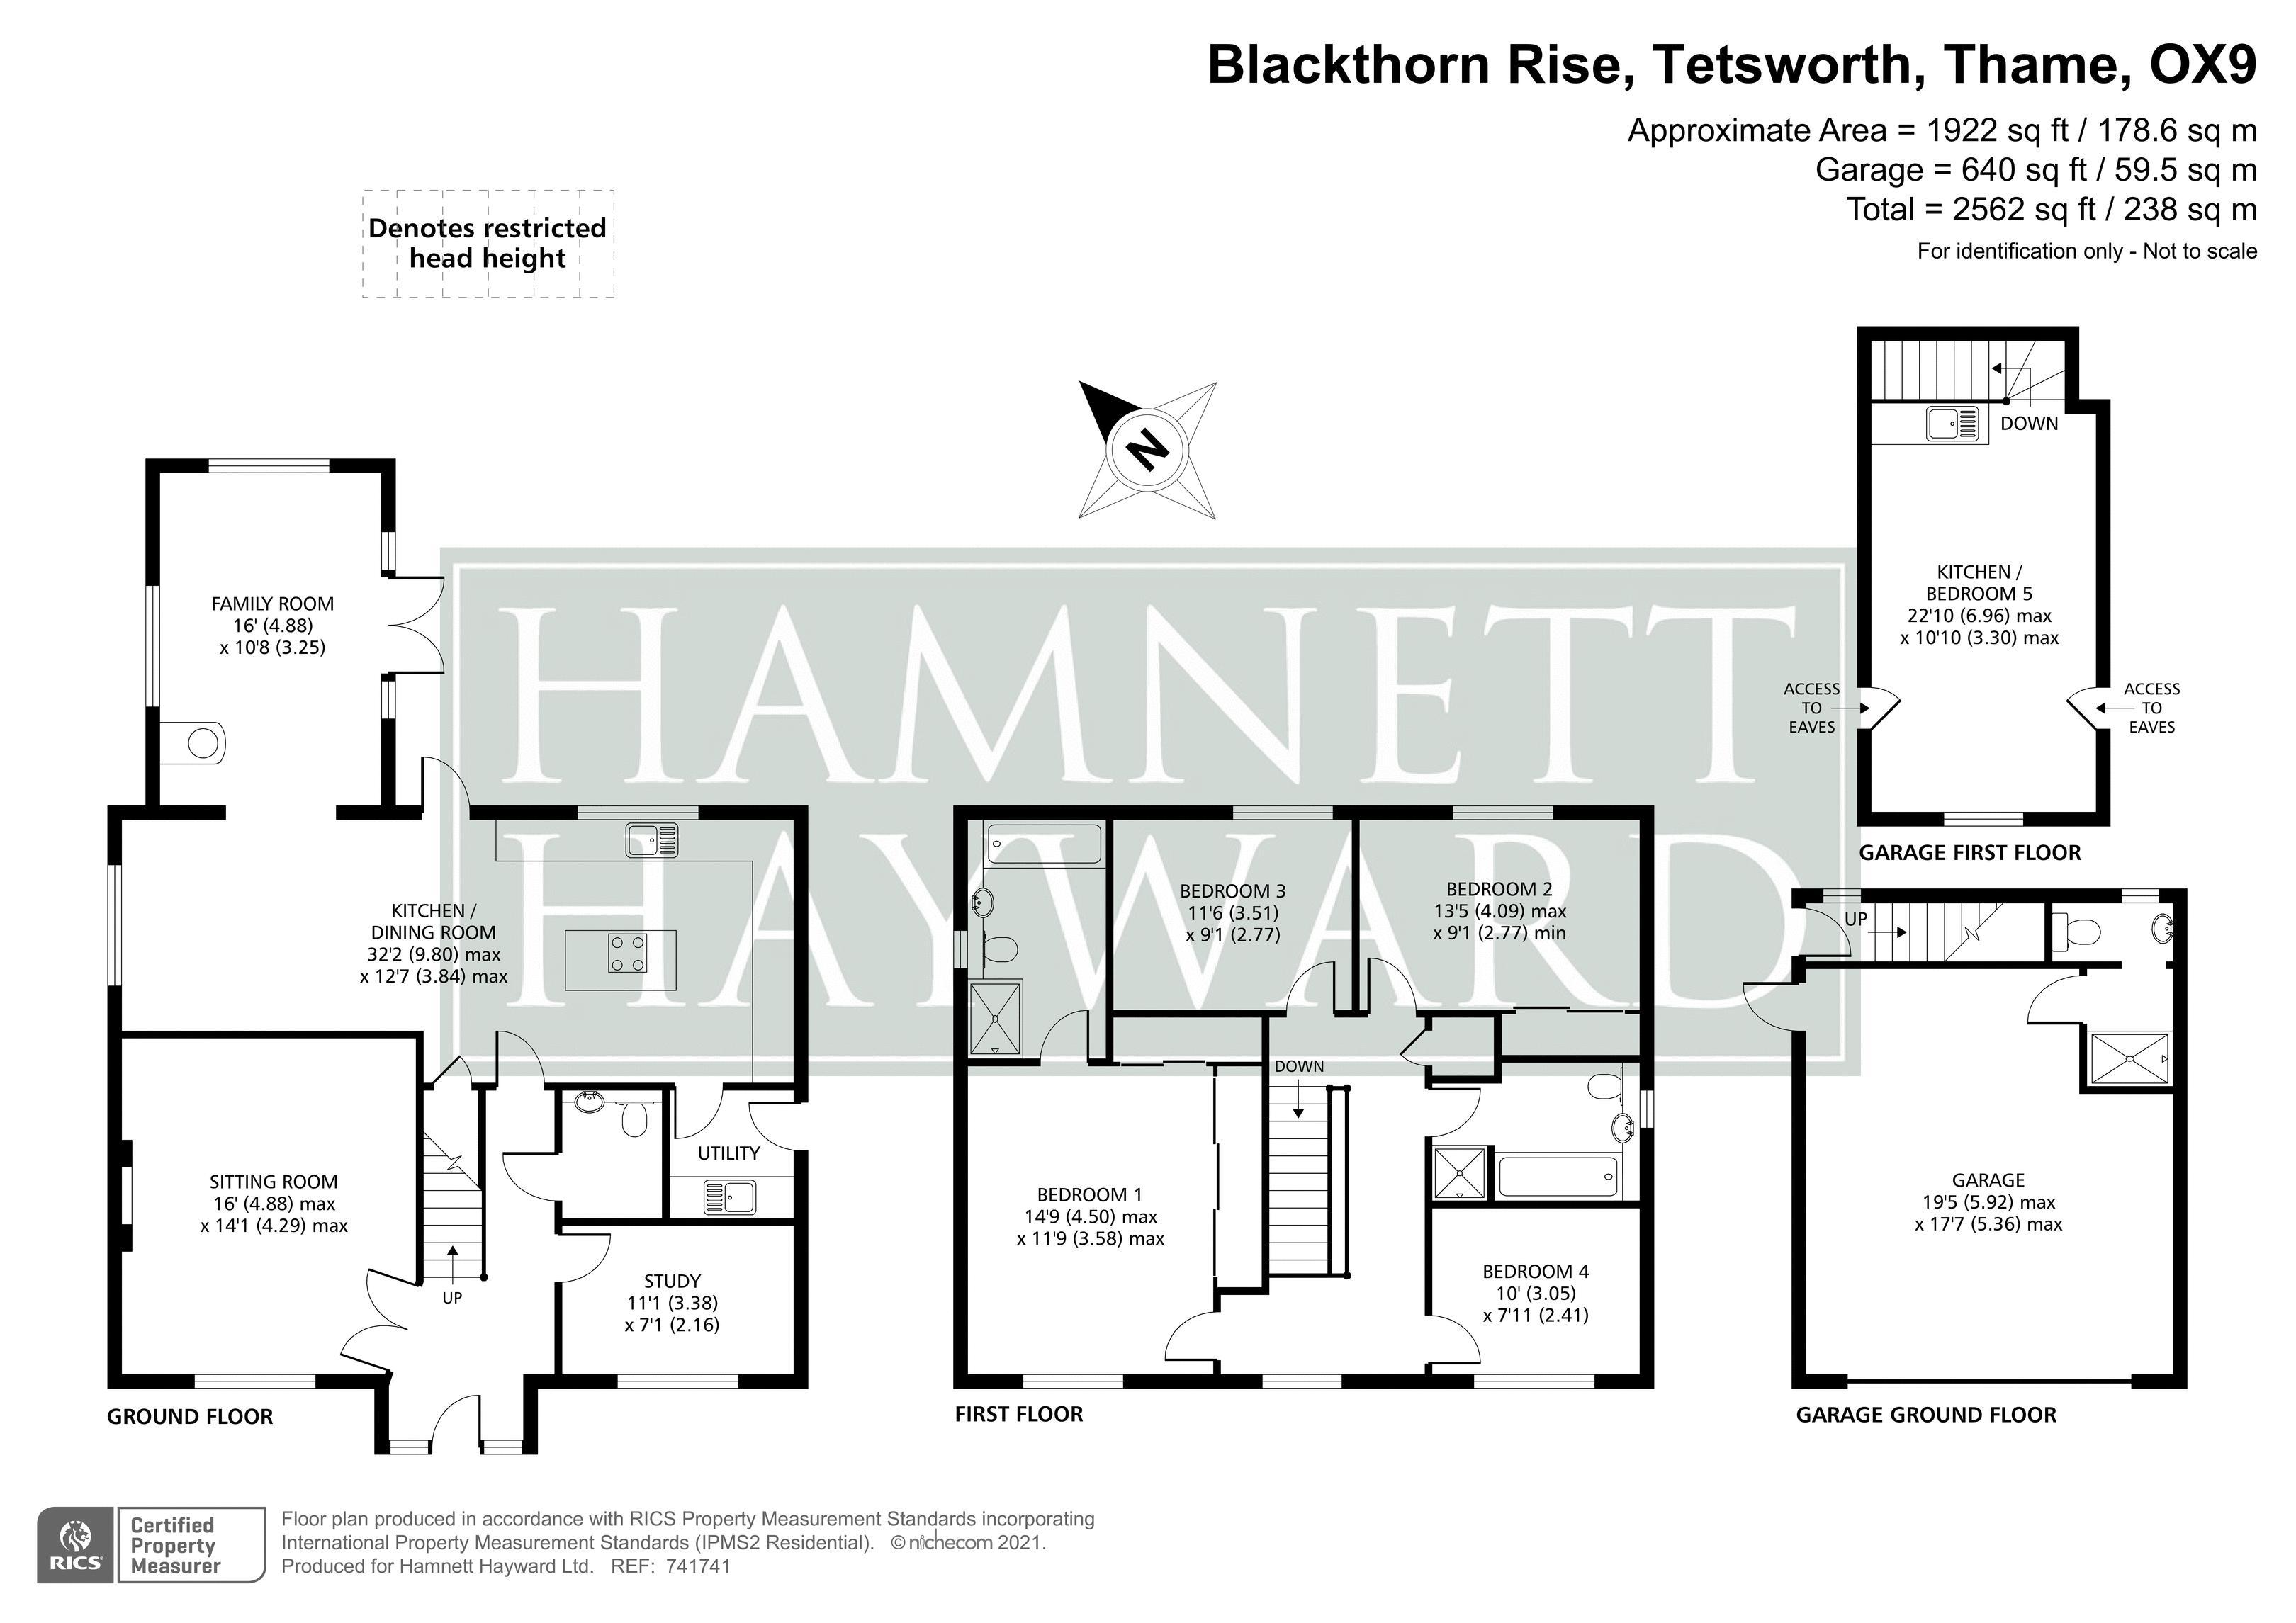 Blackthorn Rise Tetsworth